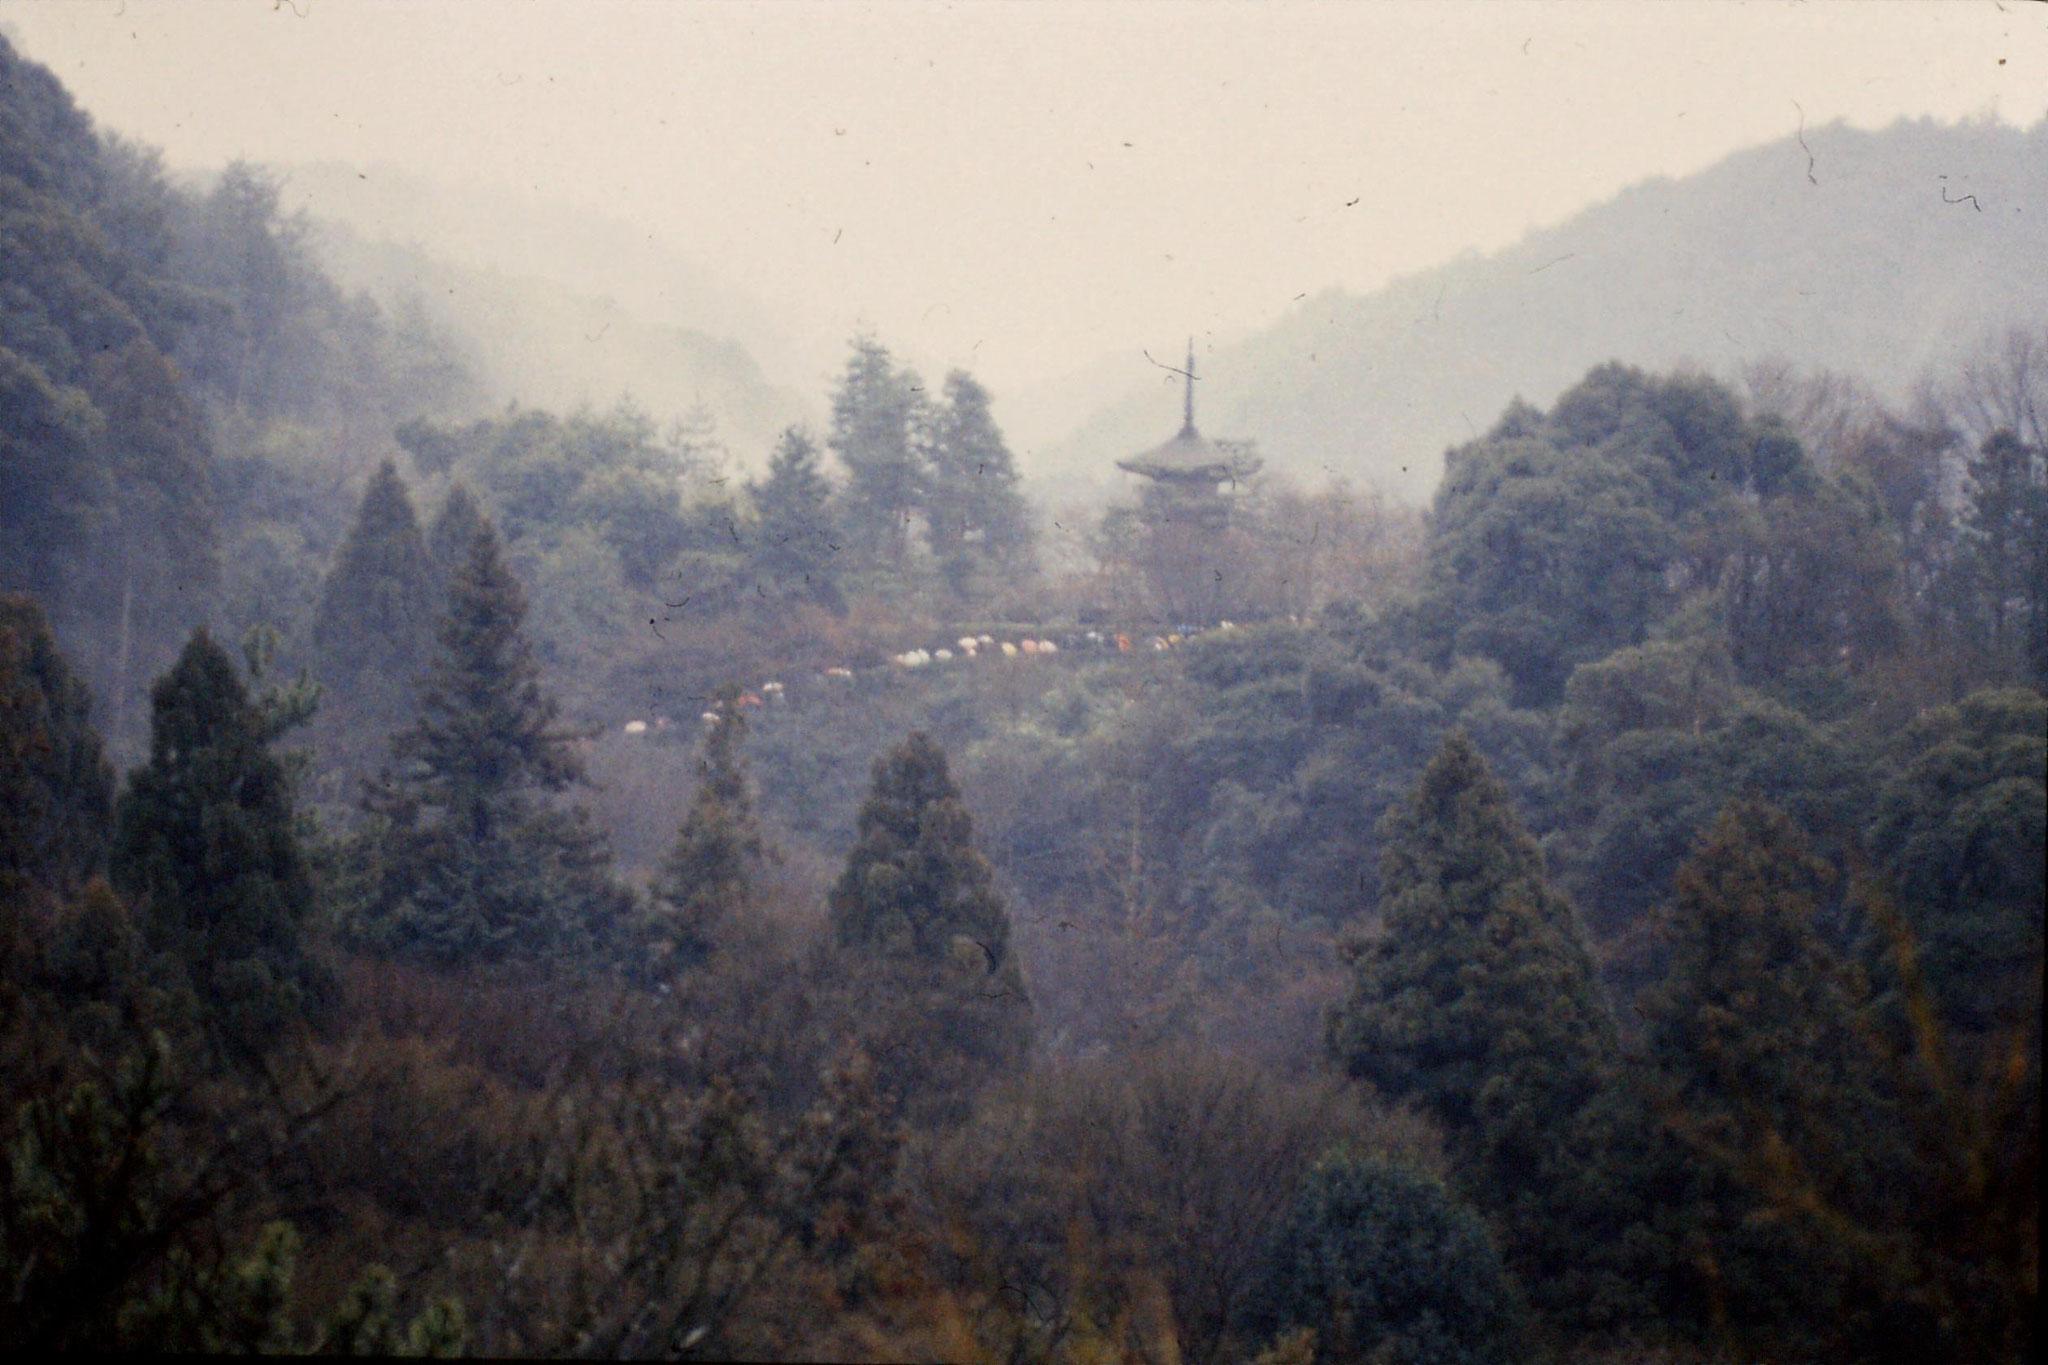 26/1/1989: 7: Kyoto